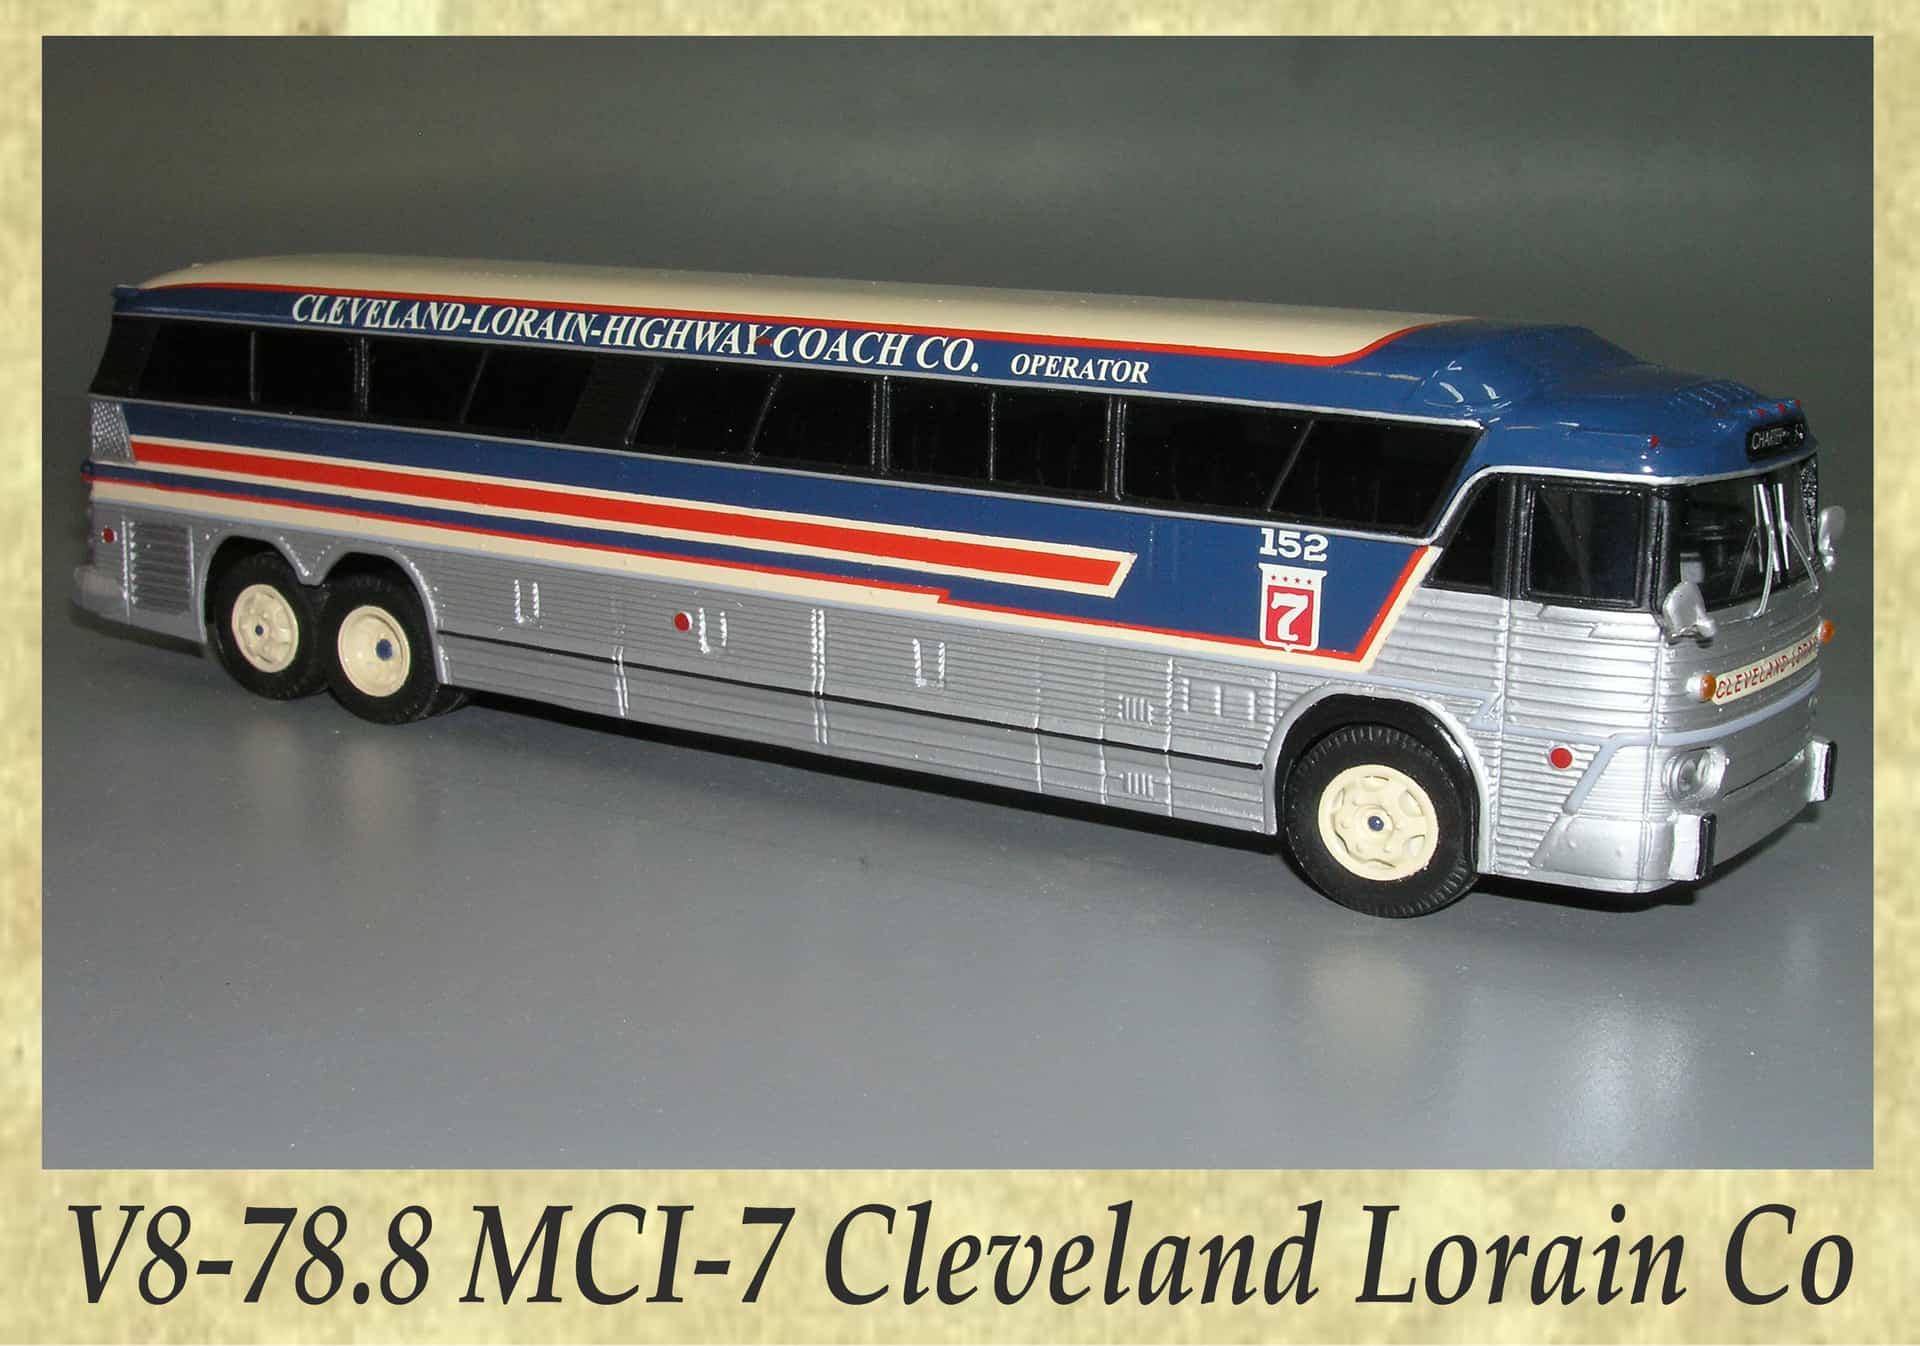 V8-78.8 MCI-7 Cleveland Lorain Co